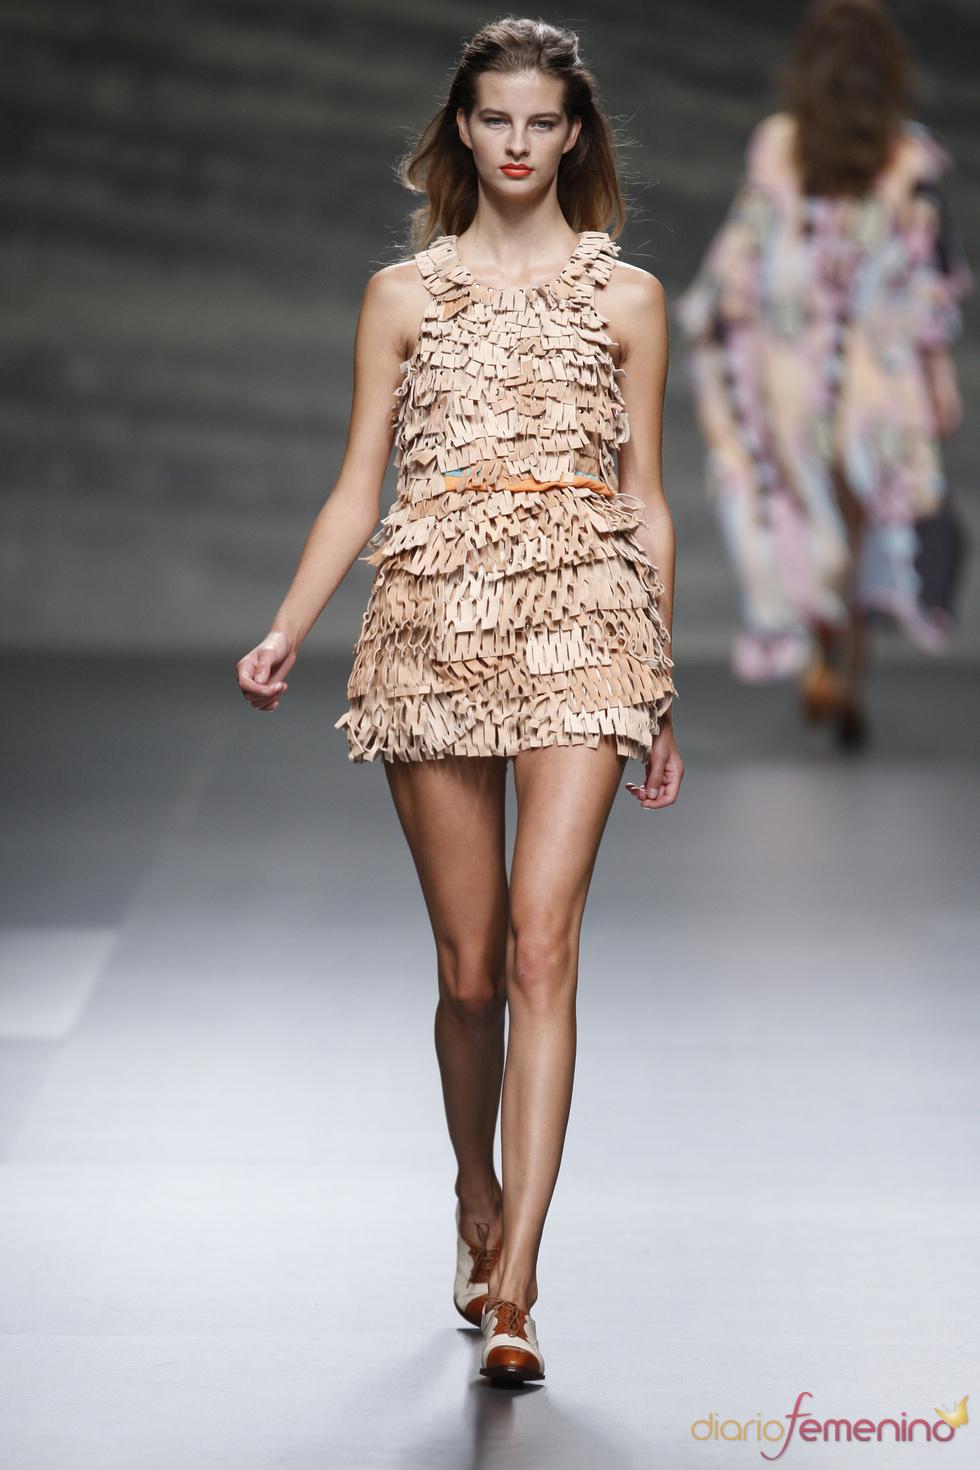 Vestido con microcapas de cuero perforado firmado por Martin Lamothe